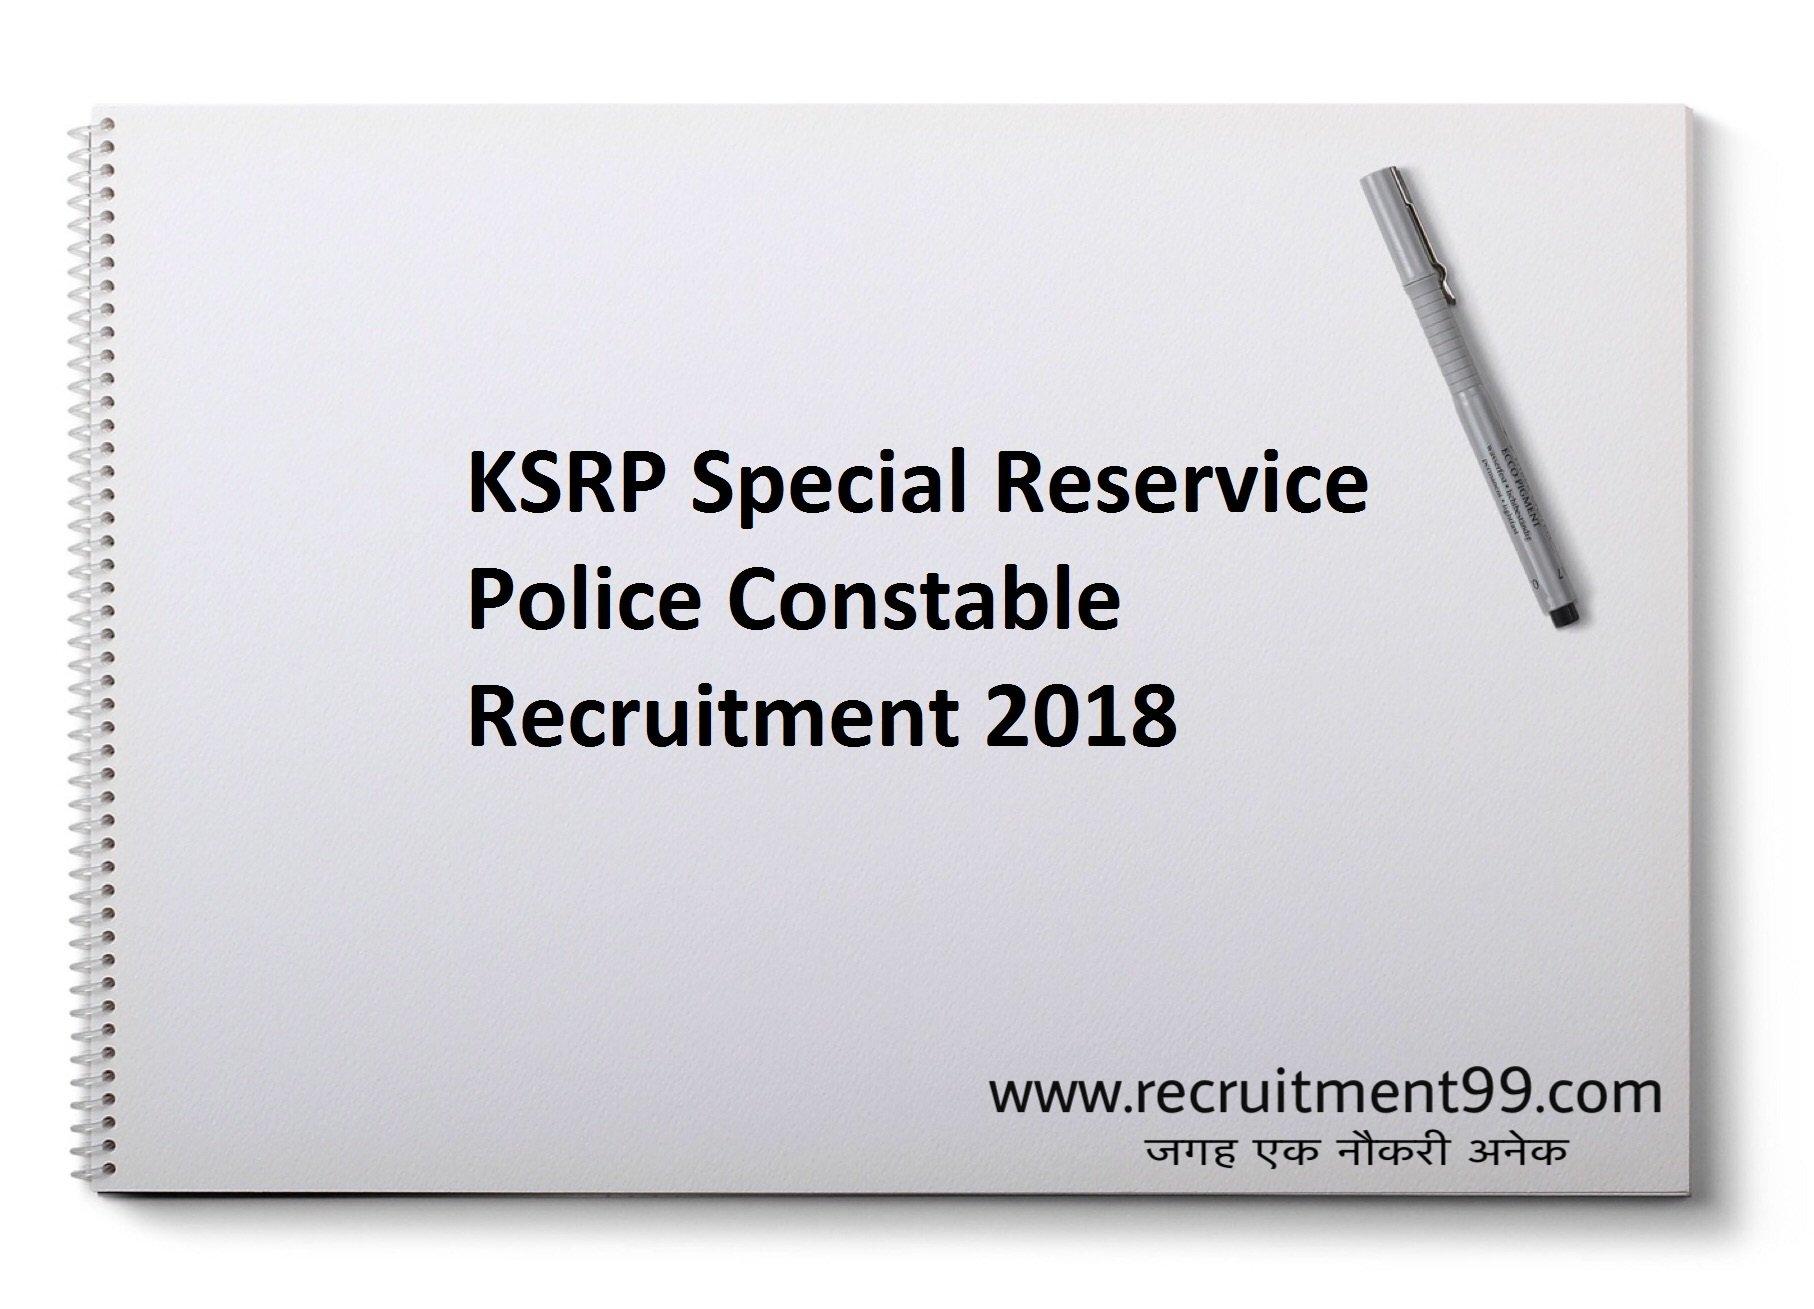 KSP Constable Recruitment Hall Ticket Result 2018